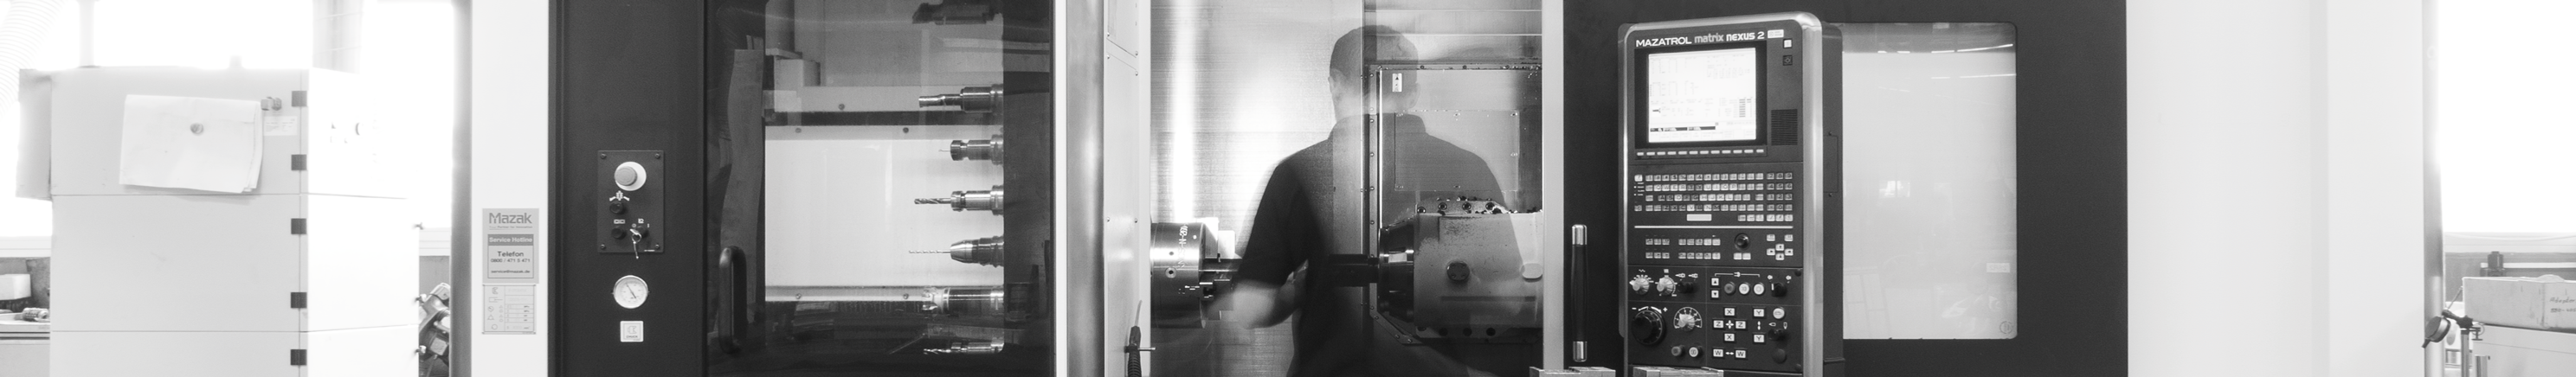 Career at Henninger, Cutting Machine Operator